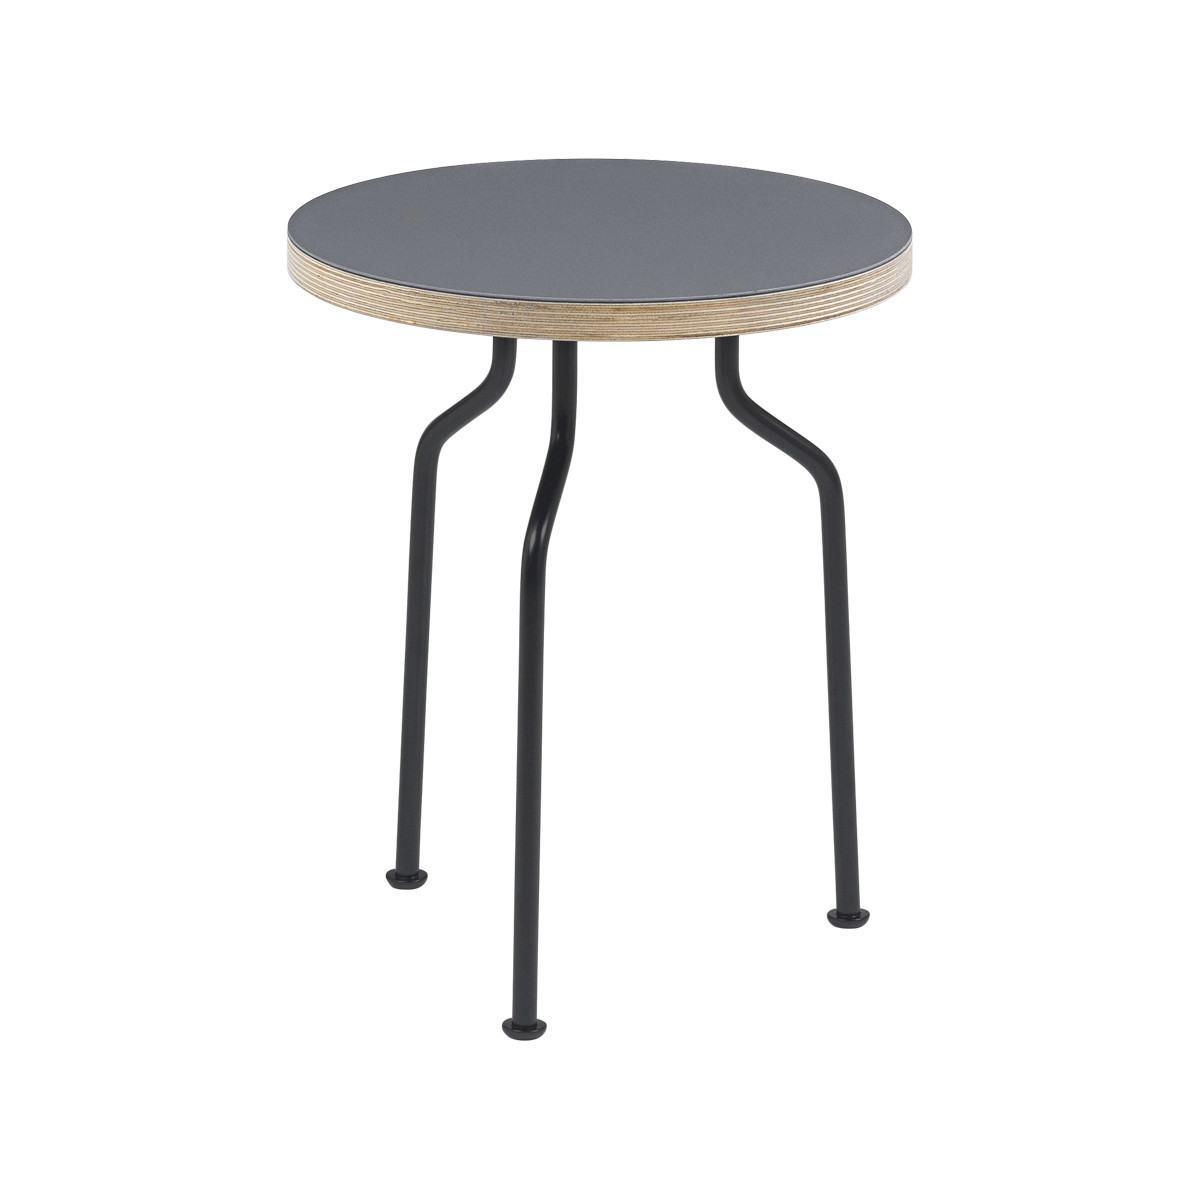 Gubi Modern Line Side Table - Round, 35cm Diameter